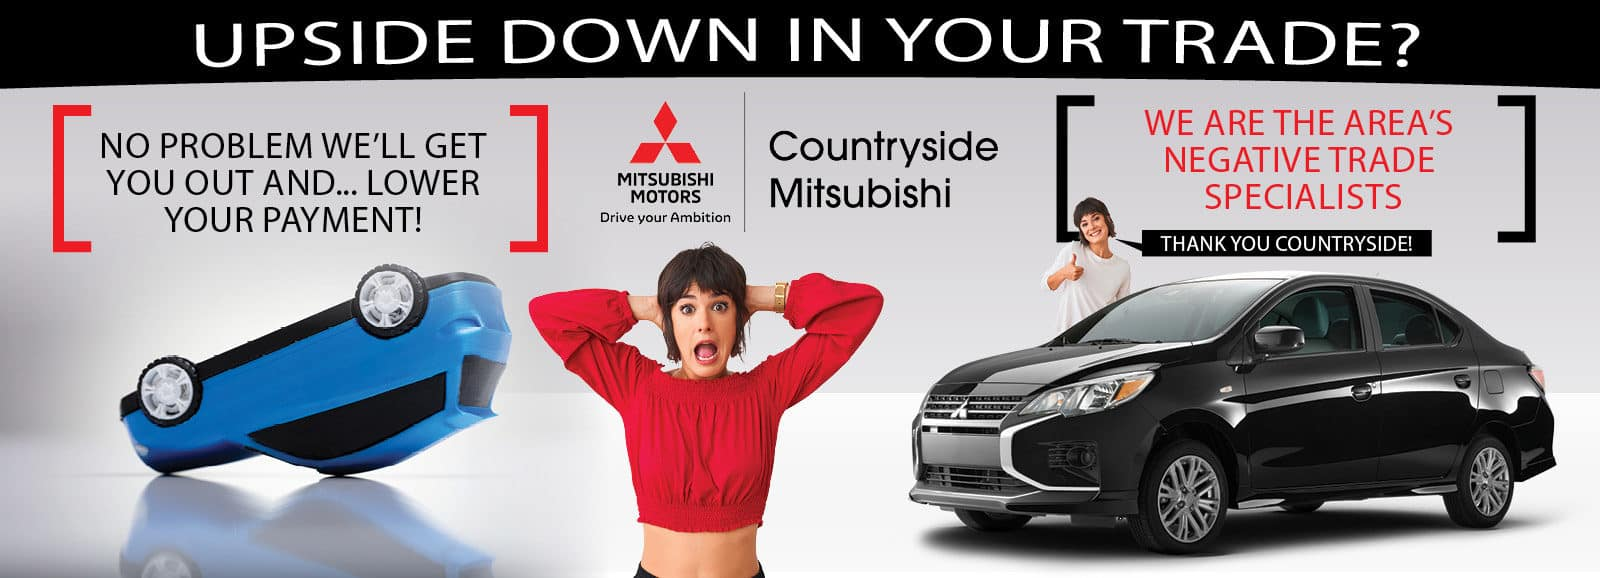 031.178.02_Countryside_Mitsubishi_ 1600x578_upside_Dealer Web